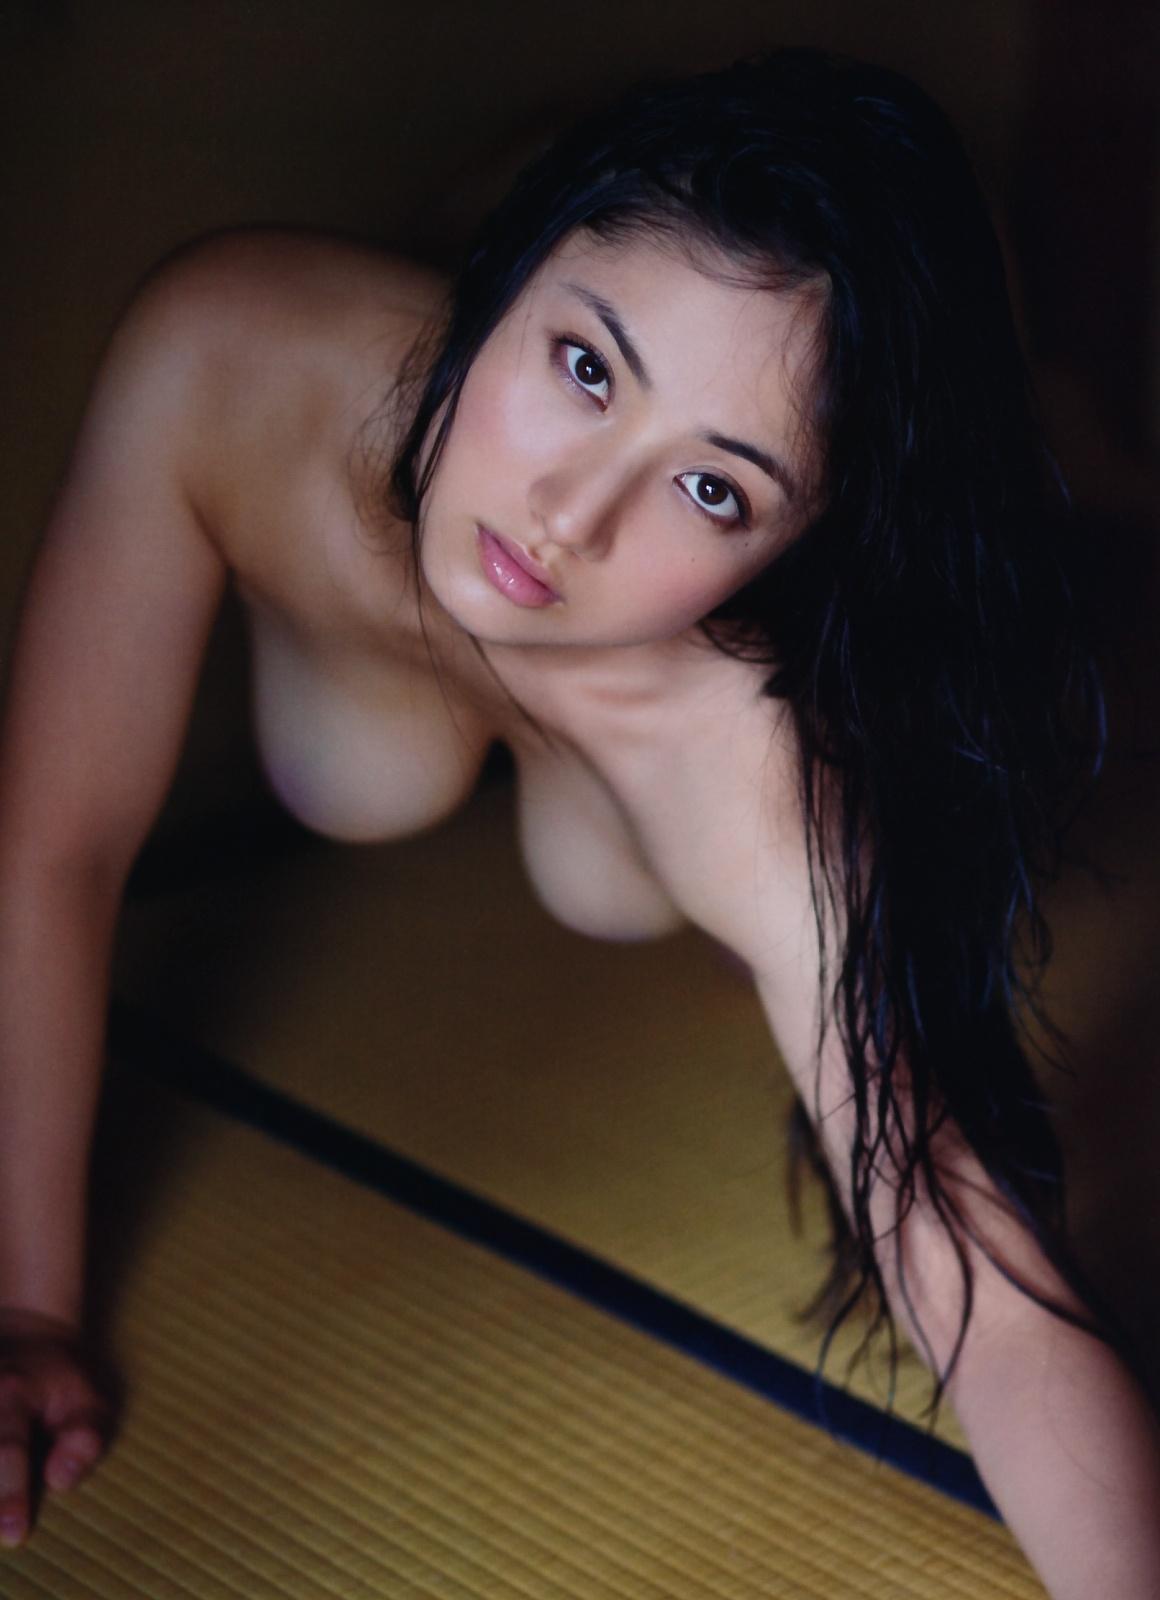 紗綾 part99★ [無断転載禁止]©bbspink.comYouTube動画>1本 ->画像>177枚